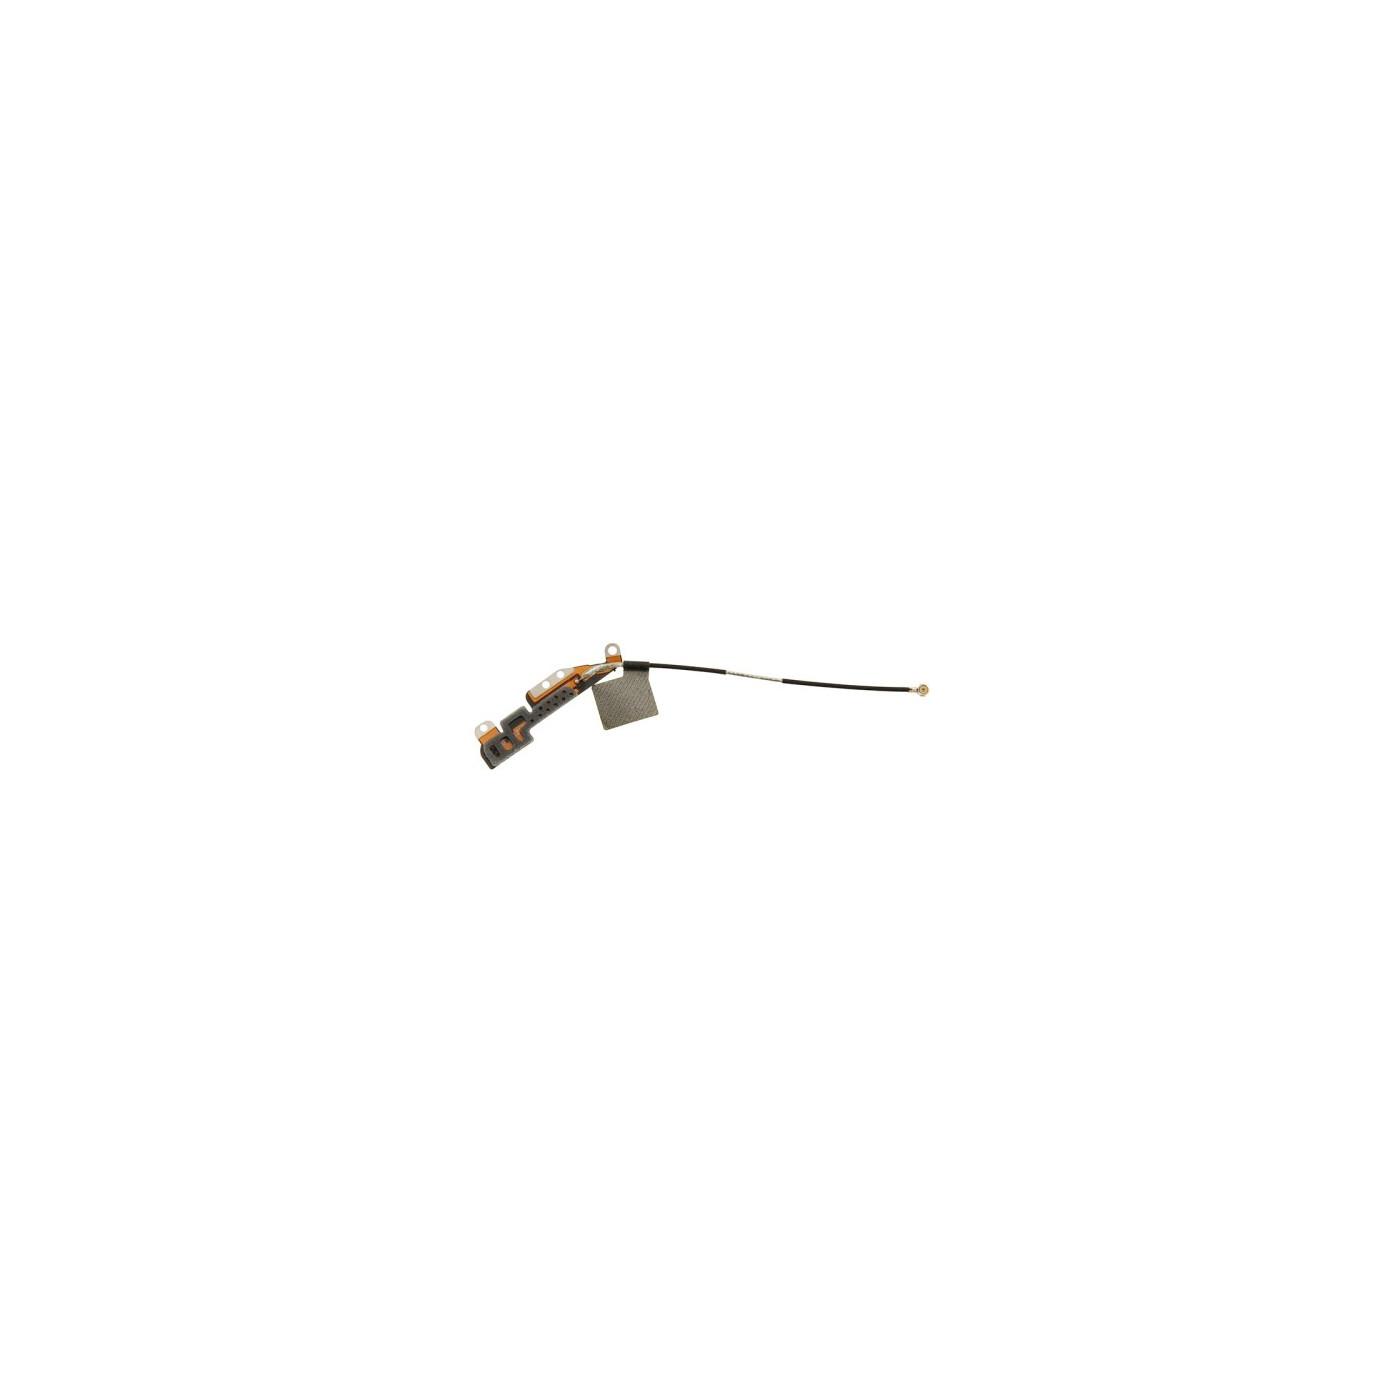 GPS antenna module for iPad mini 3 flat flex parts